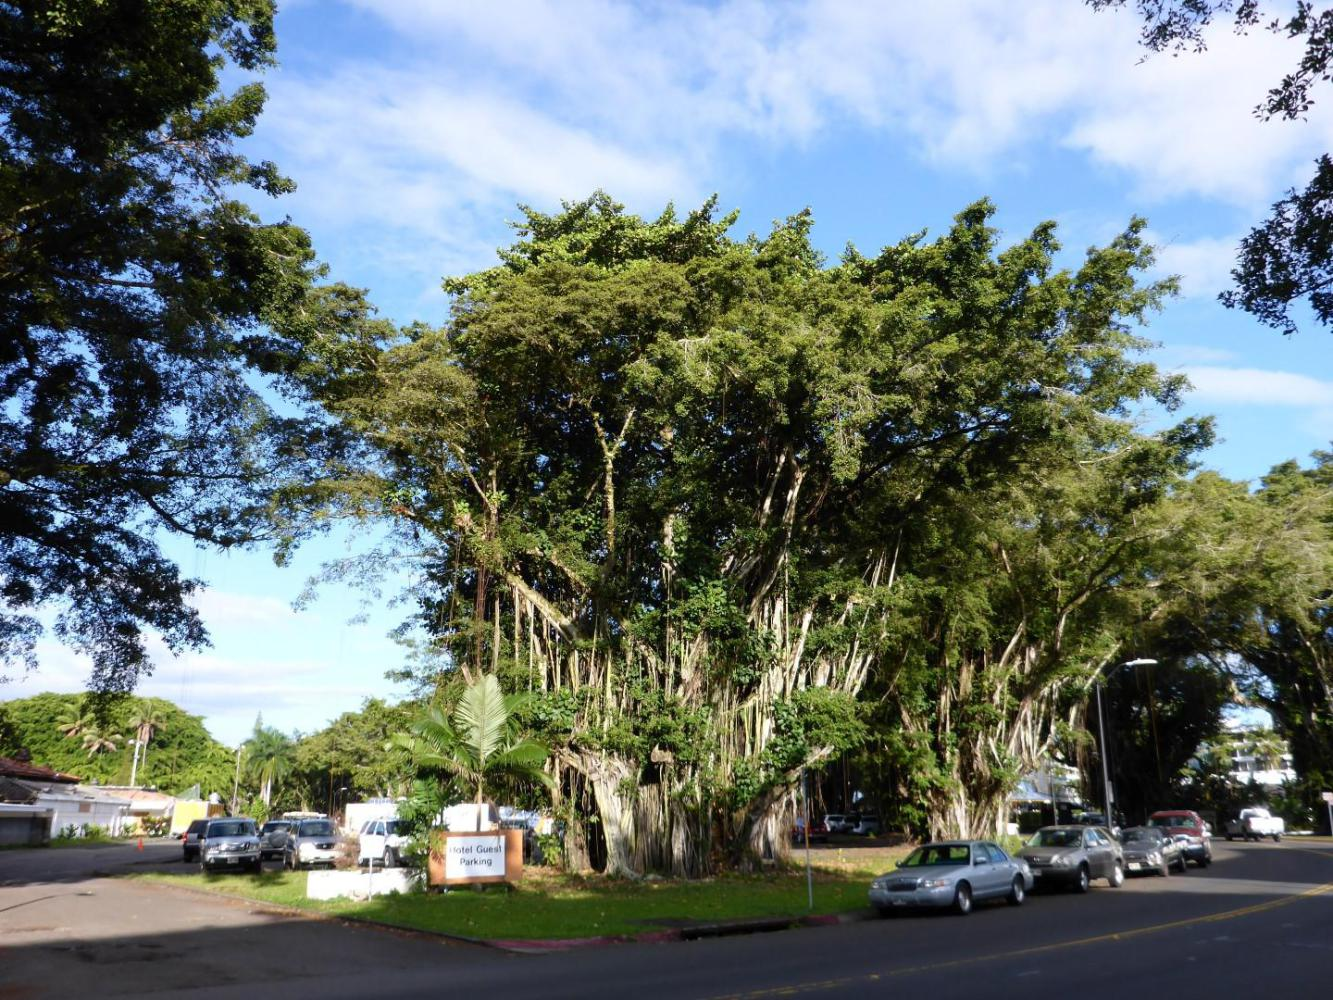 Hilo is full of banyan trees.